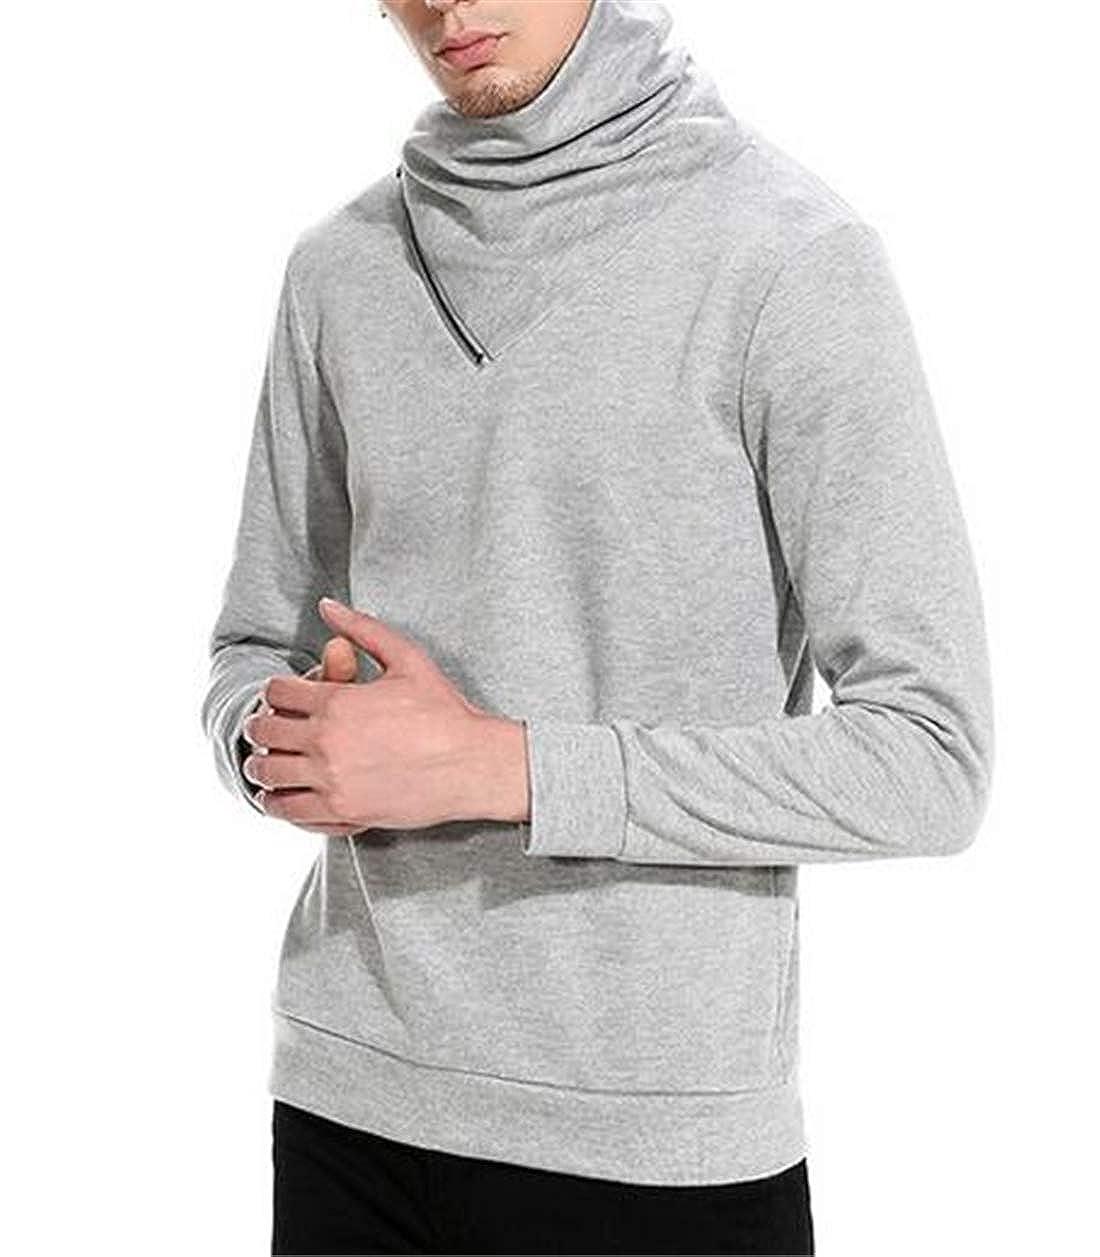 Spirio Men Basic Pullover Long Sleeve Knitting Oblique Zipper Casual Shawl Collar Sweater